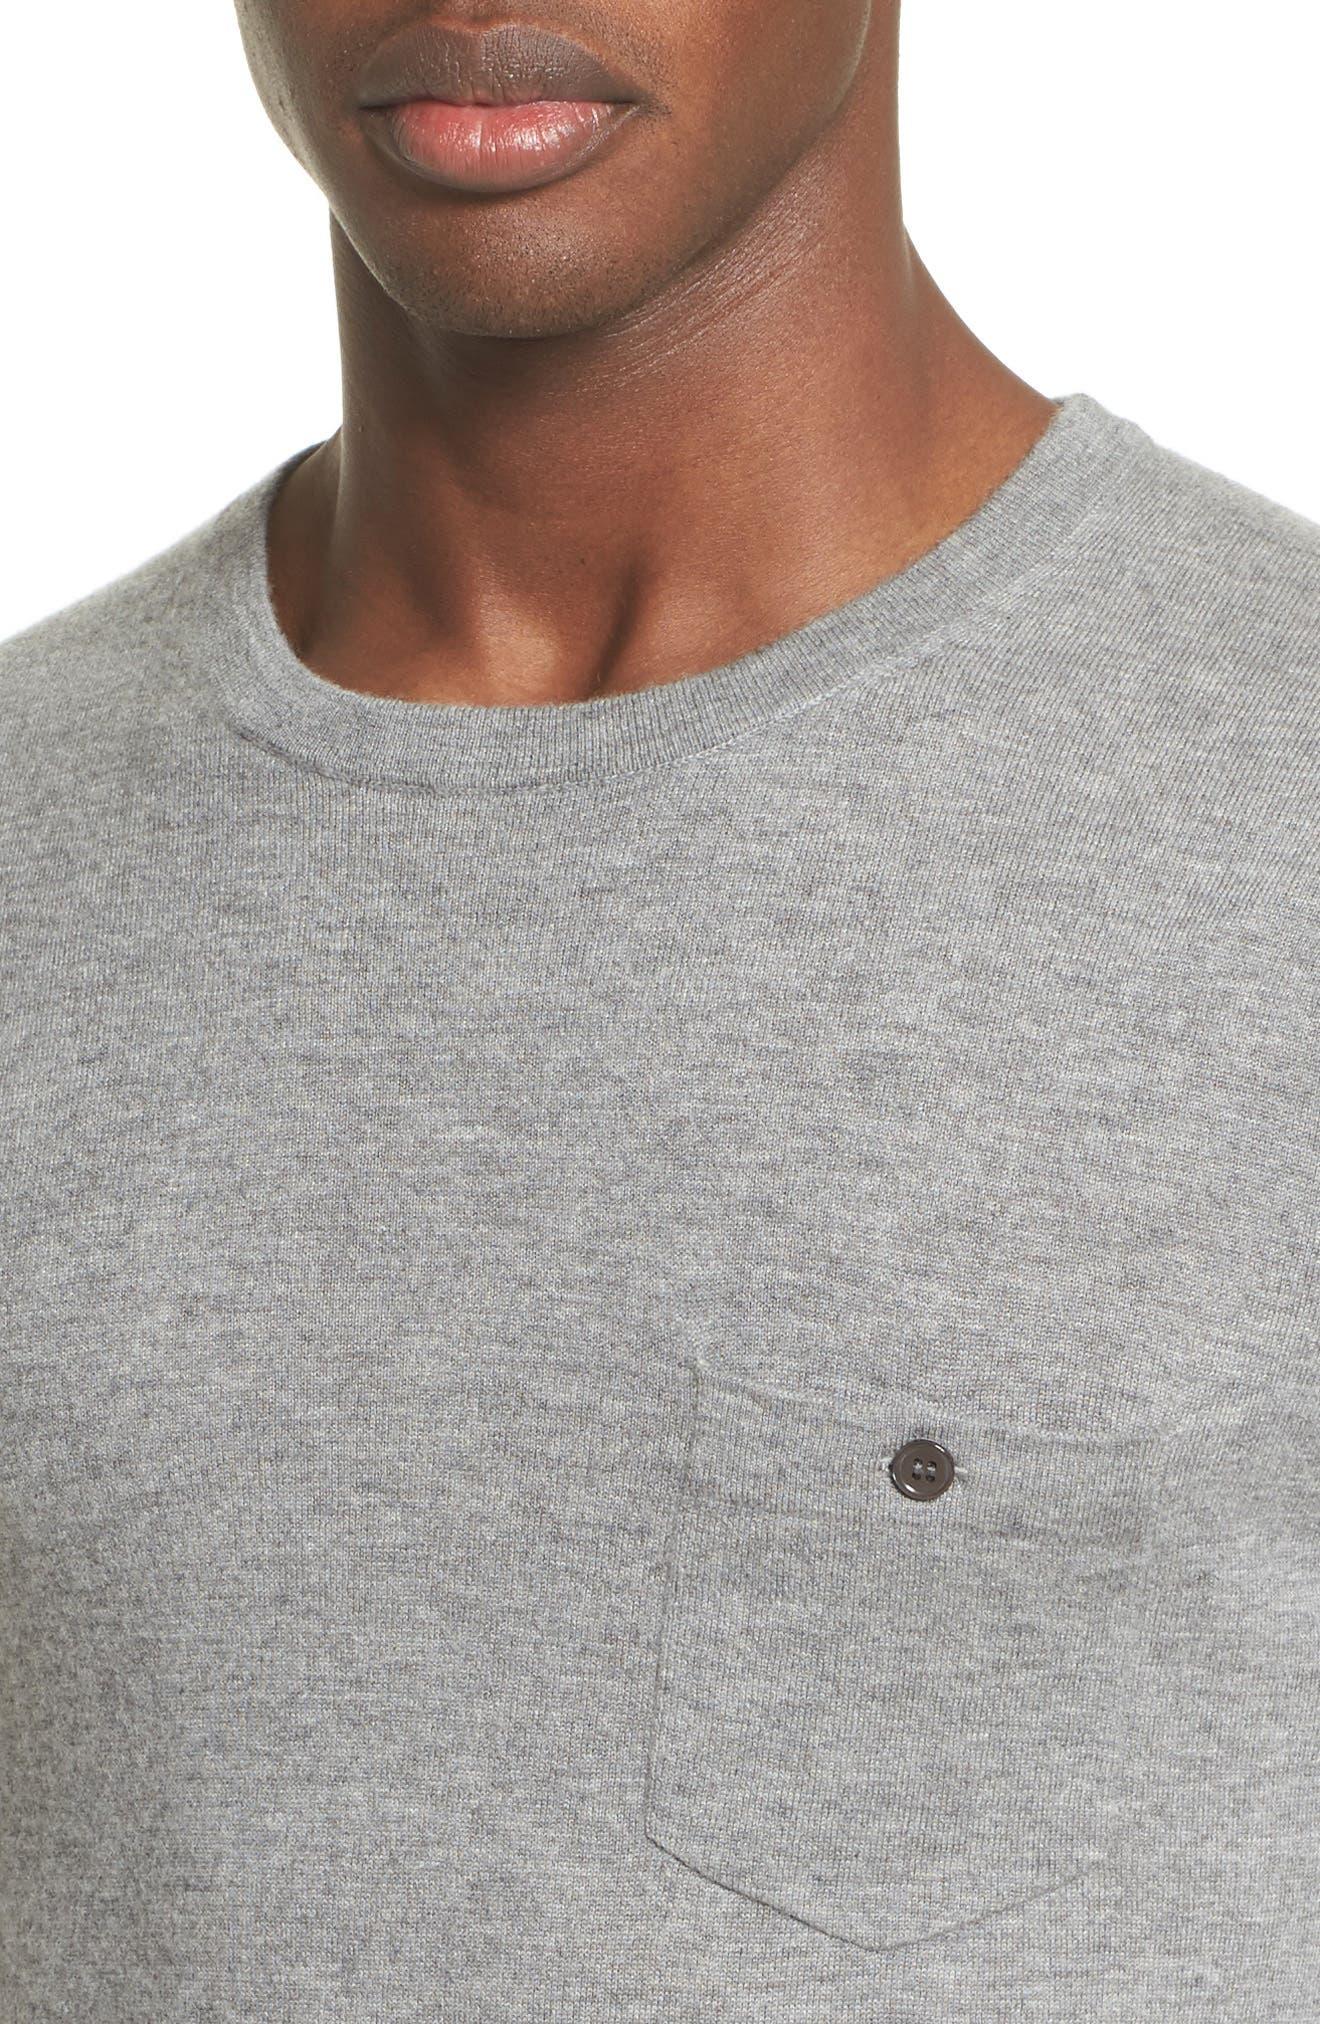 Cashmere Pocket T-Shirt,                             Alternate thumbnail 4, color,                             Grey Heather